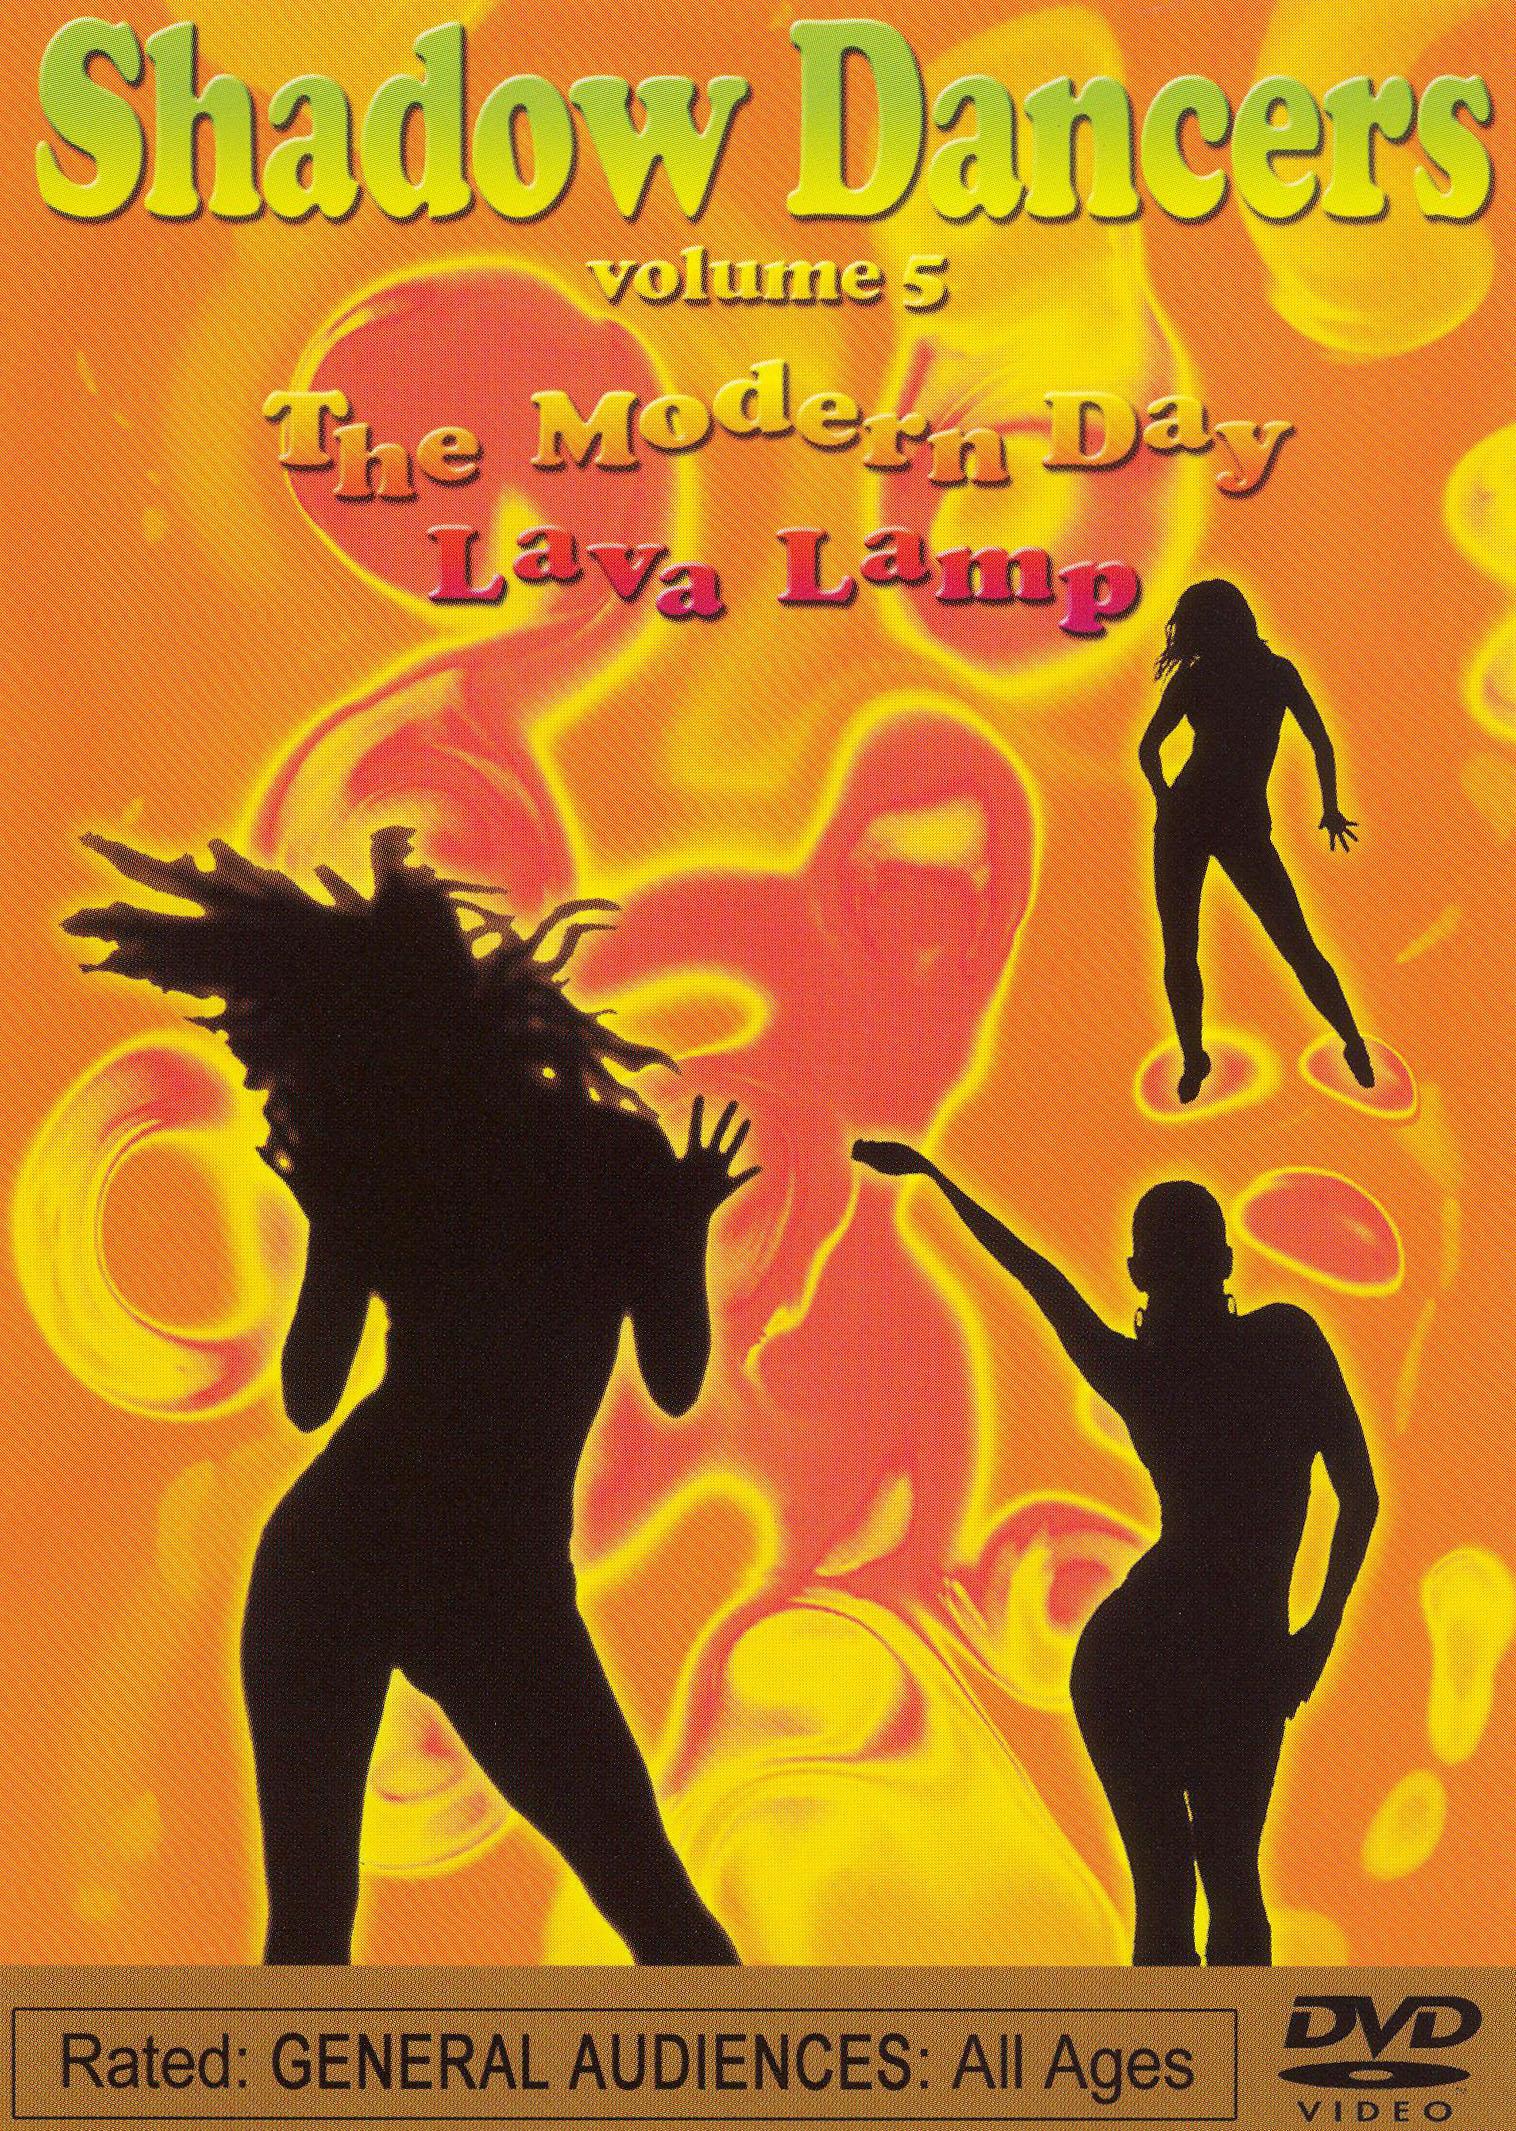 Shadow Dancers, Vol. 5: Modern Day Lava Lamp